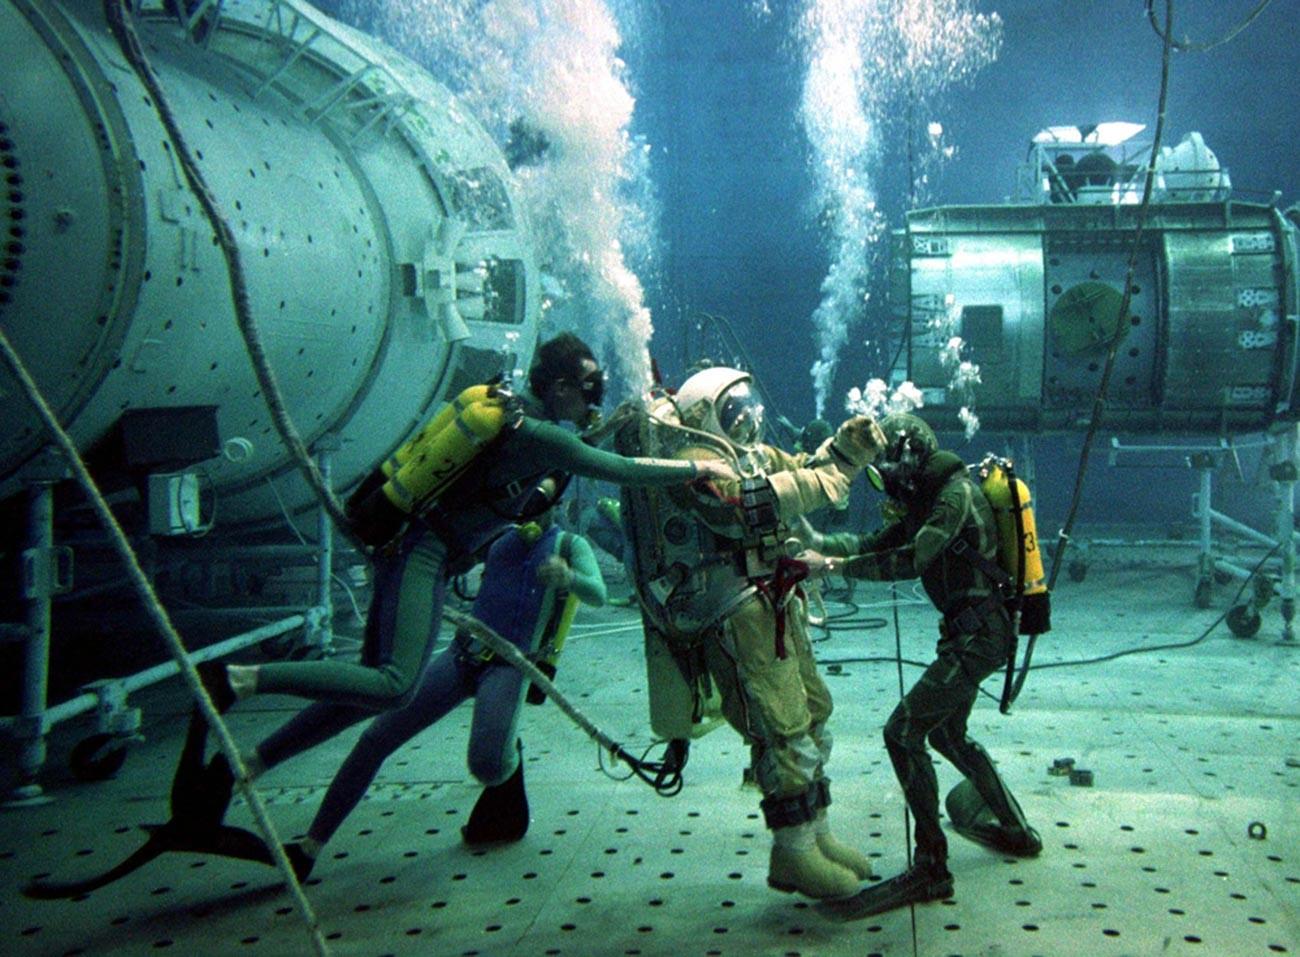 Instruktur tes Rusia Oleg Pushkar dibantu oleh penyelam selama pengujian bawah air di replika stasiun antariksa Mir yang rusak pada 4 Juli 1997.